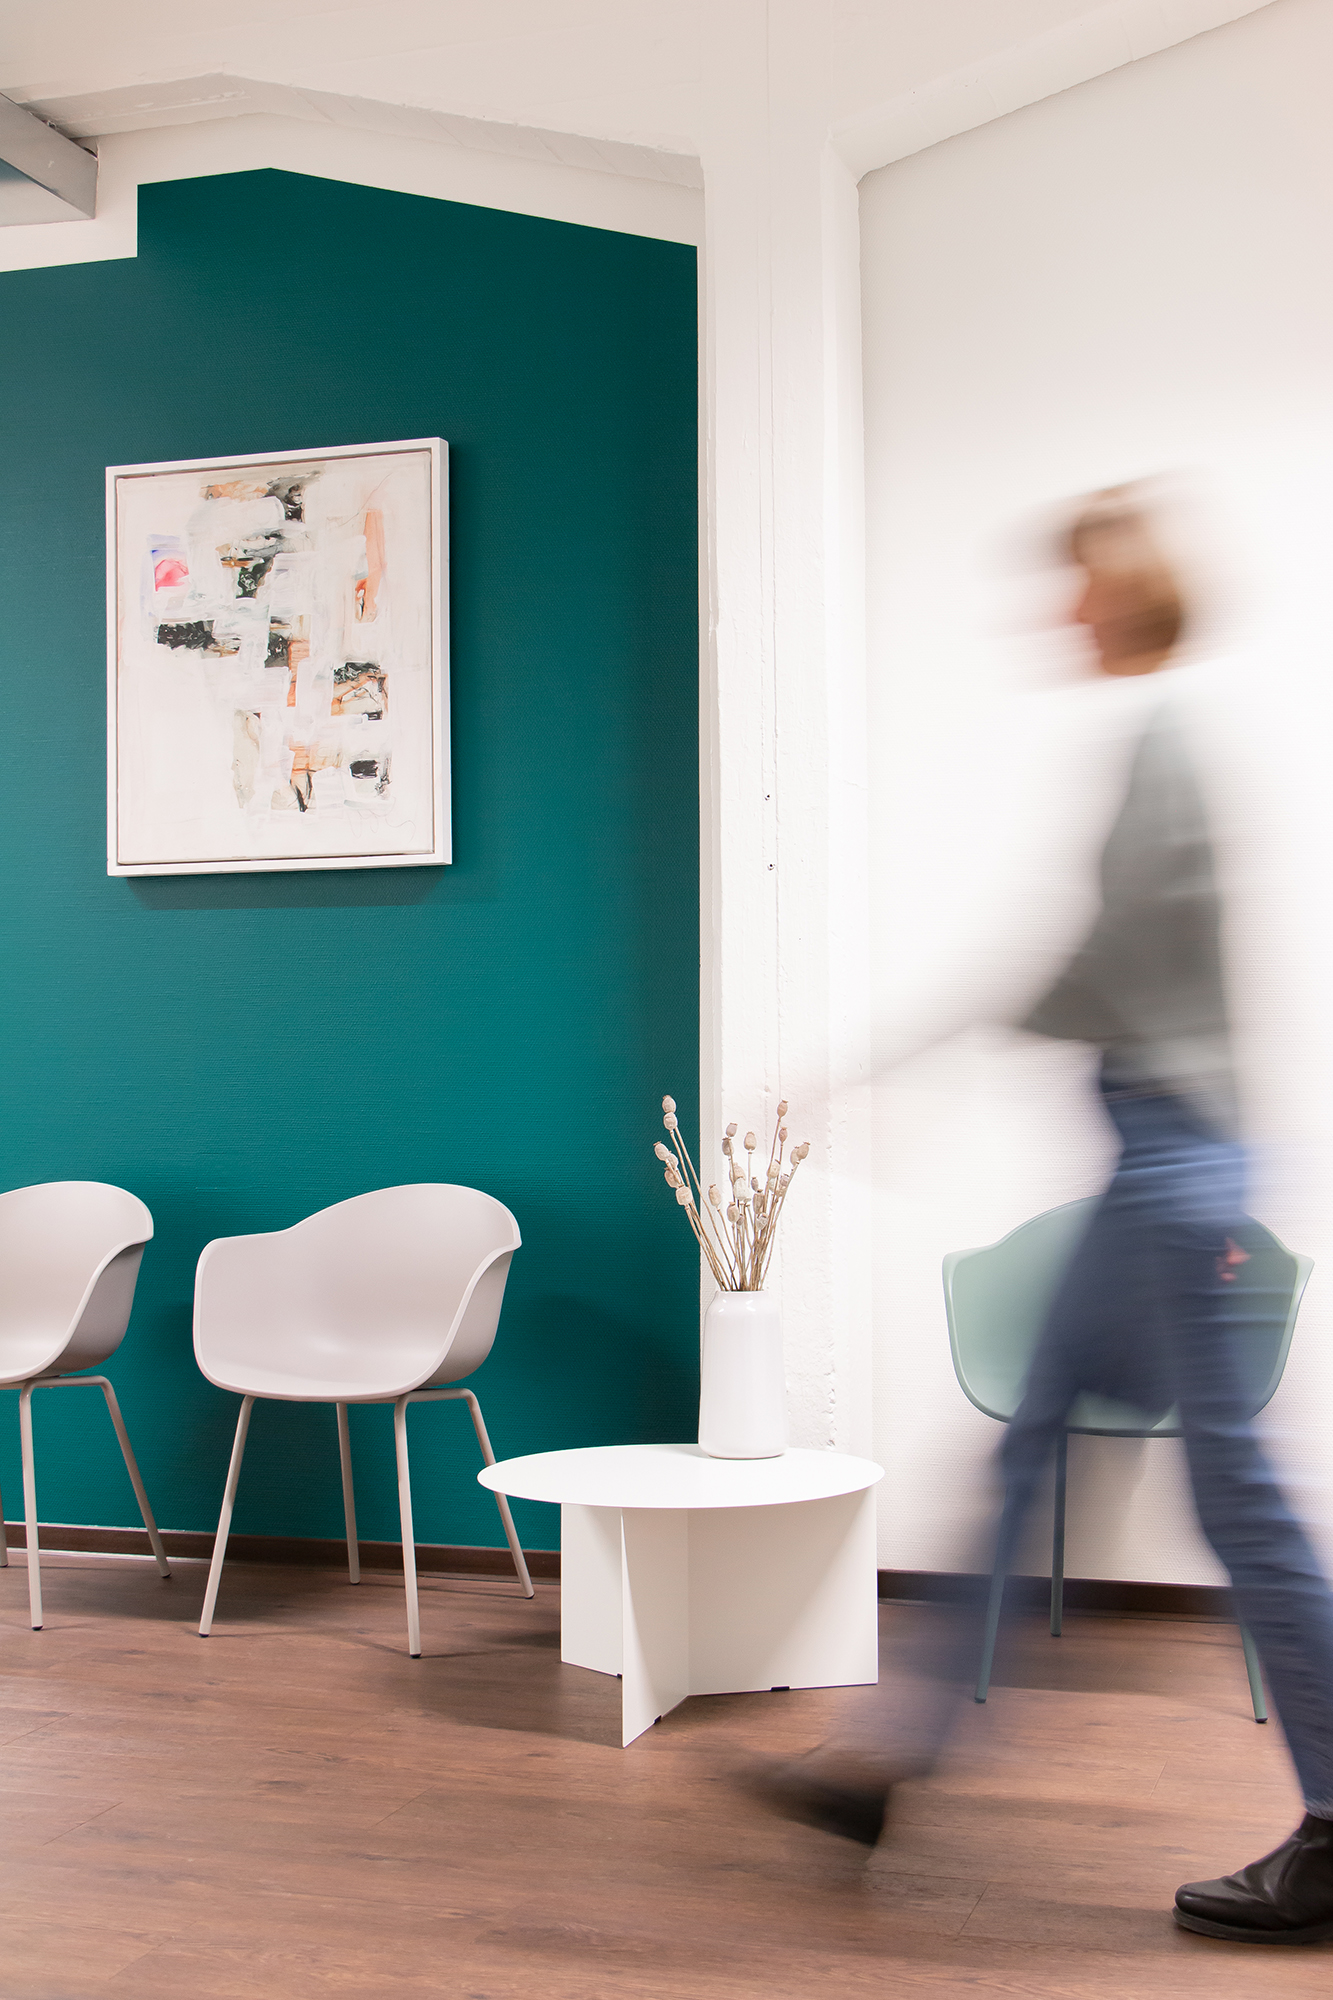 Hennings-Physio-Wartebereich-Studio-Fondo